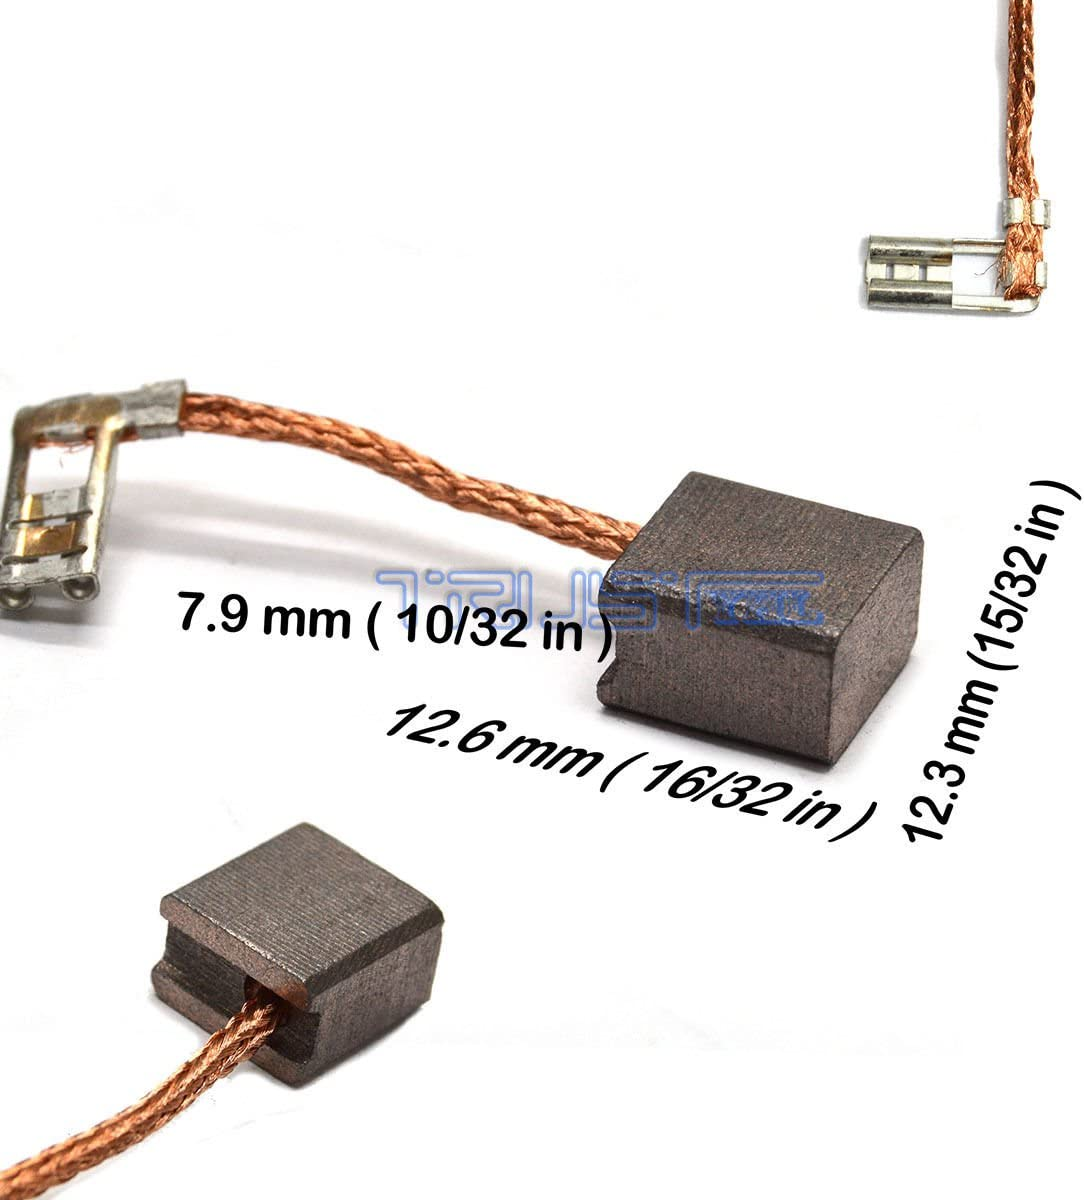 TE 72 te60 Carbon Brushes Charcoal Pencils Coals Motor Carbon For Hilti TE 60 te72